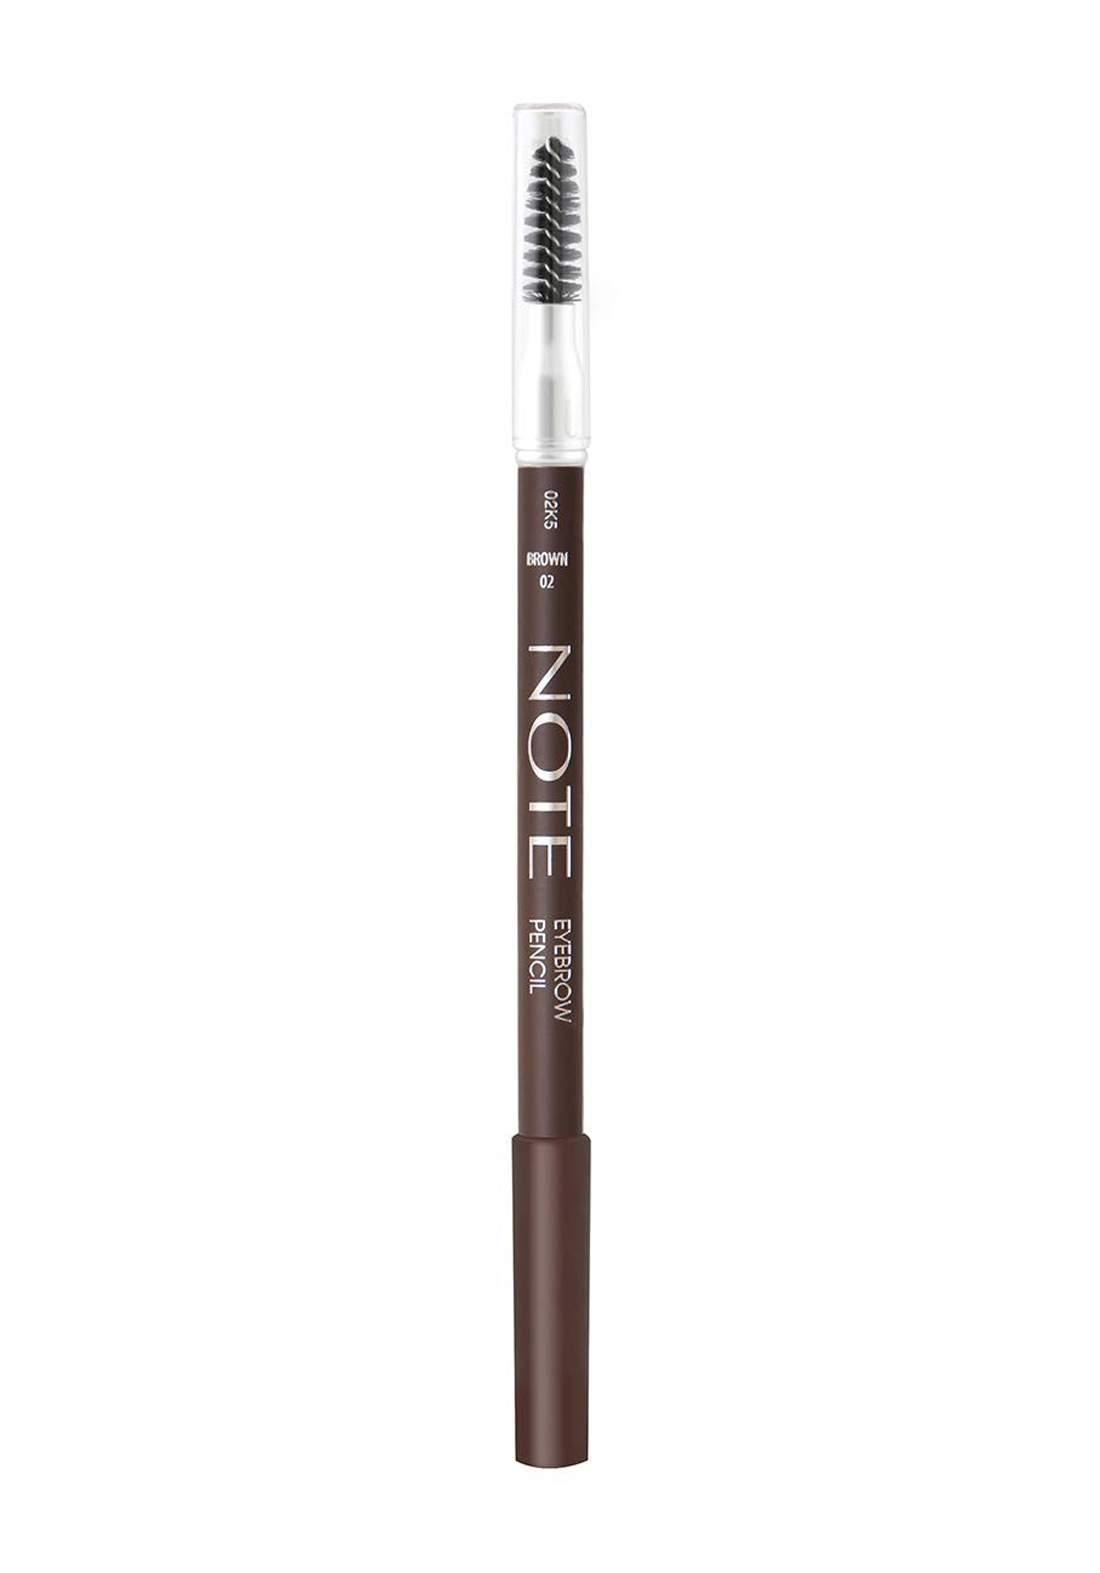 Note Eyebrow Pencil No.02 Brown 0.35g قلم تحديد الحاجب مع فرشاة